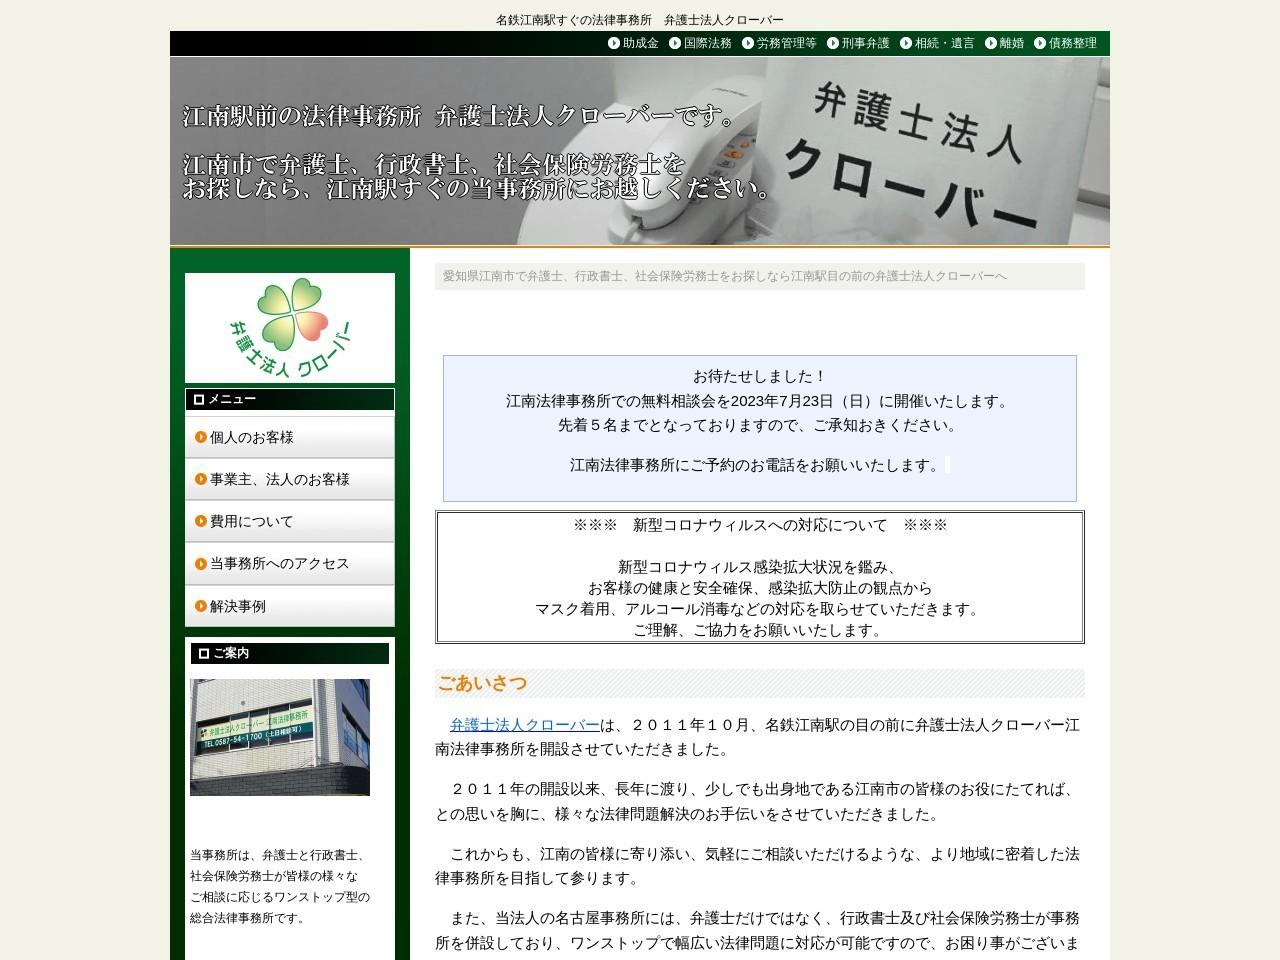 クローバー(弁護士法人)江南法律事務所